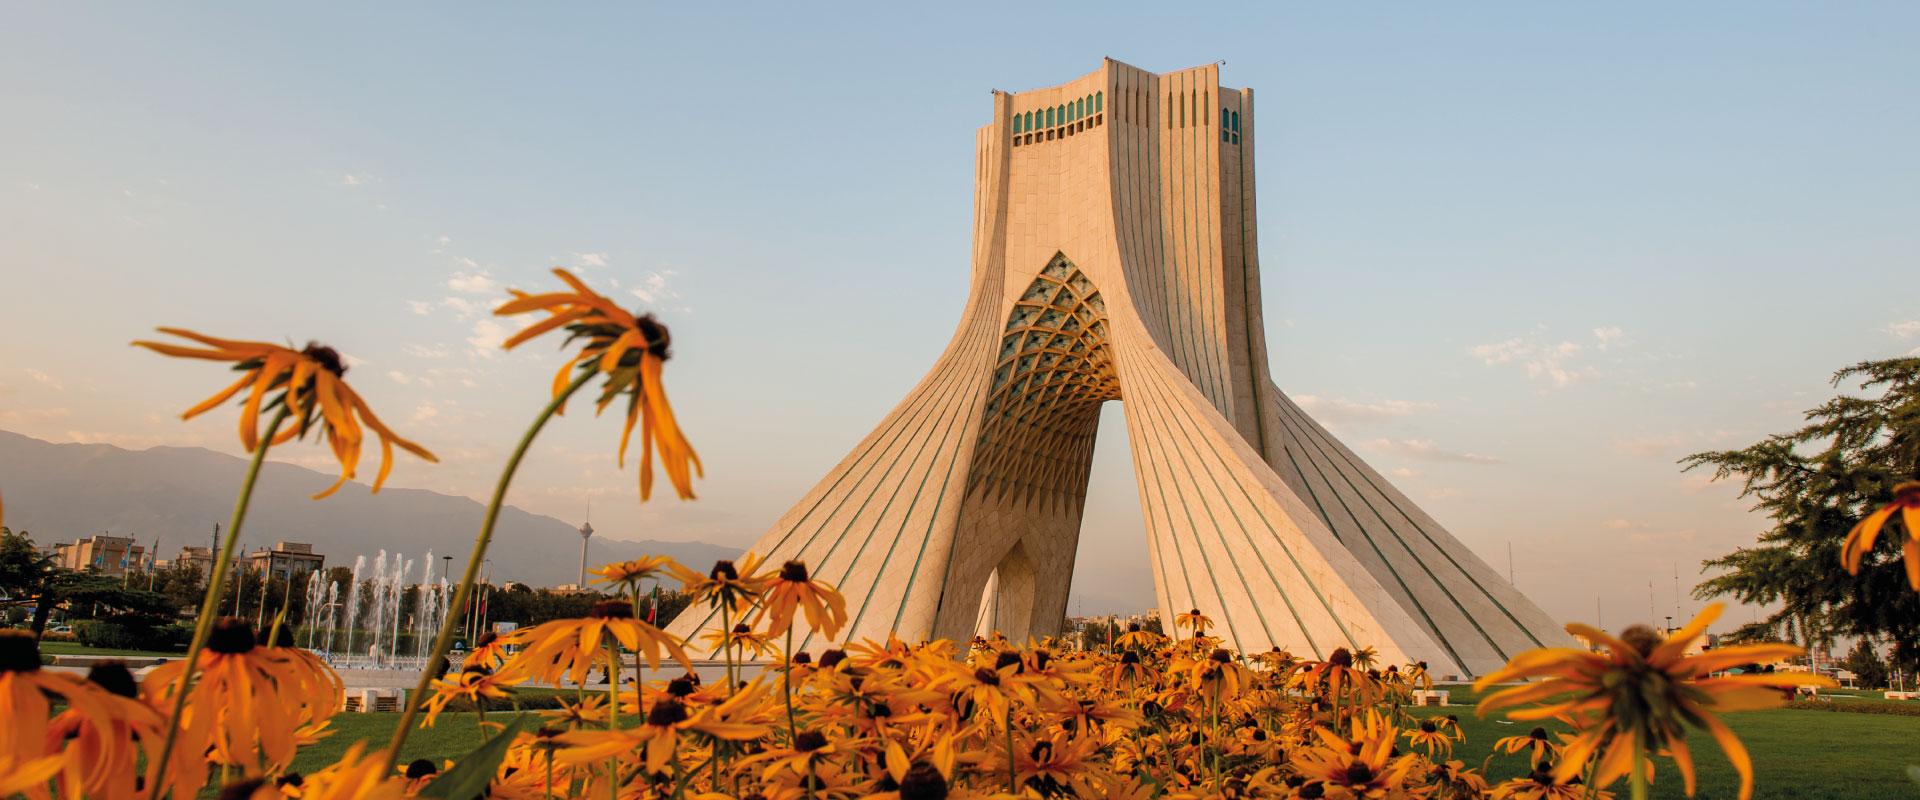 Royal Travel Manchester Tehran Iran Asia Flights